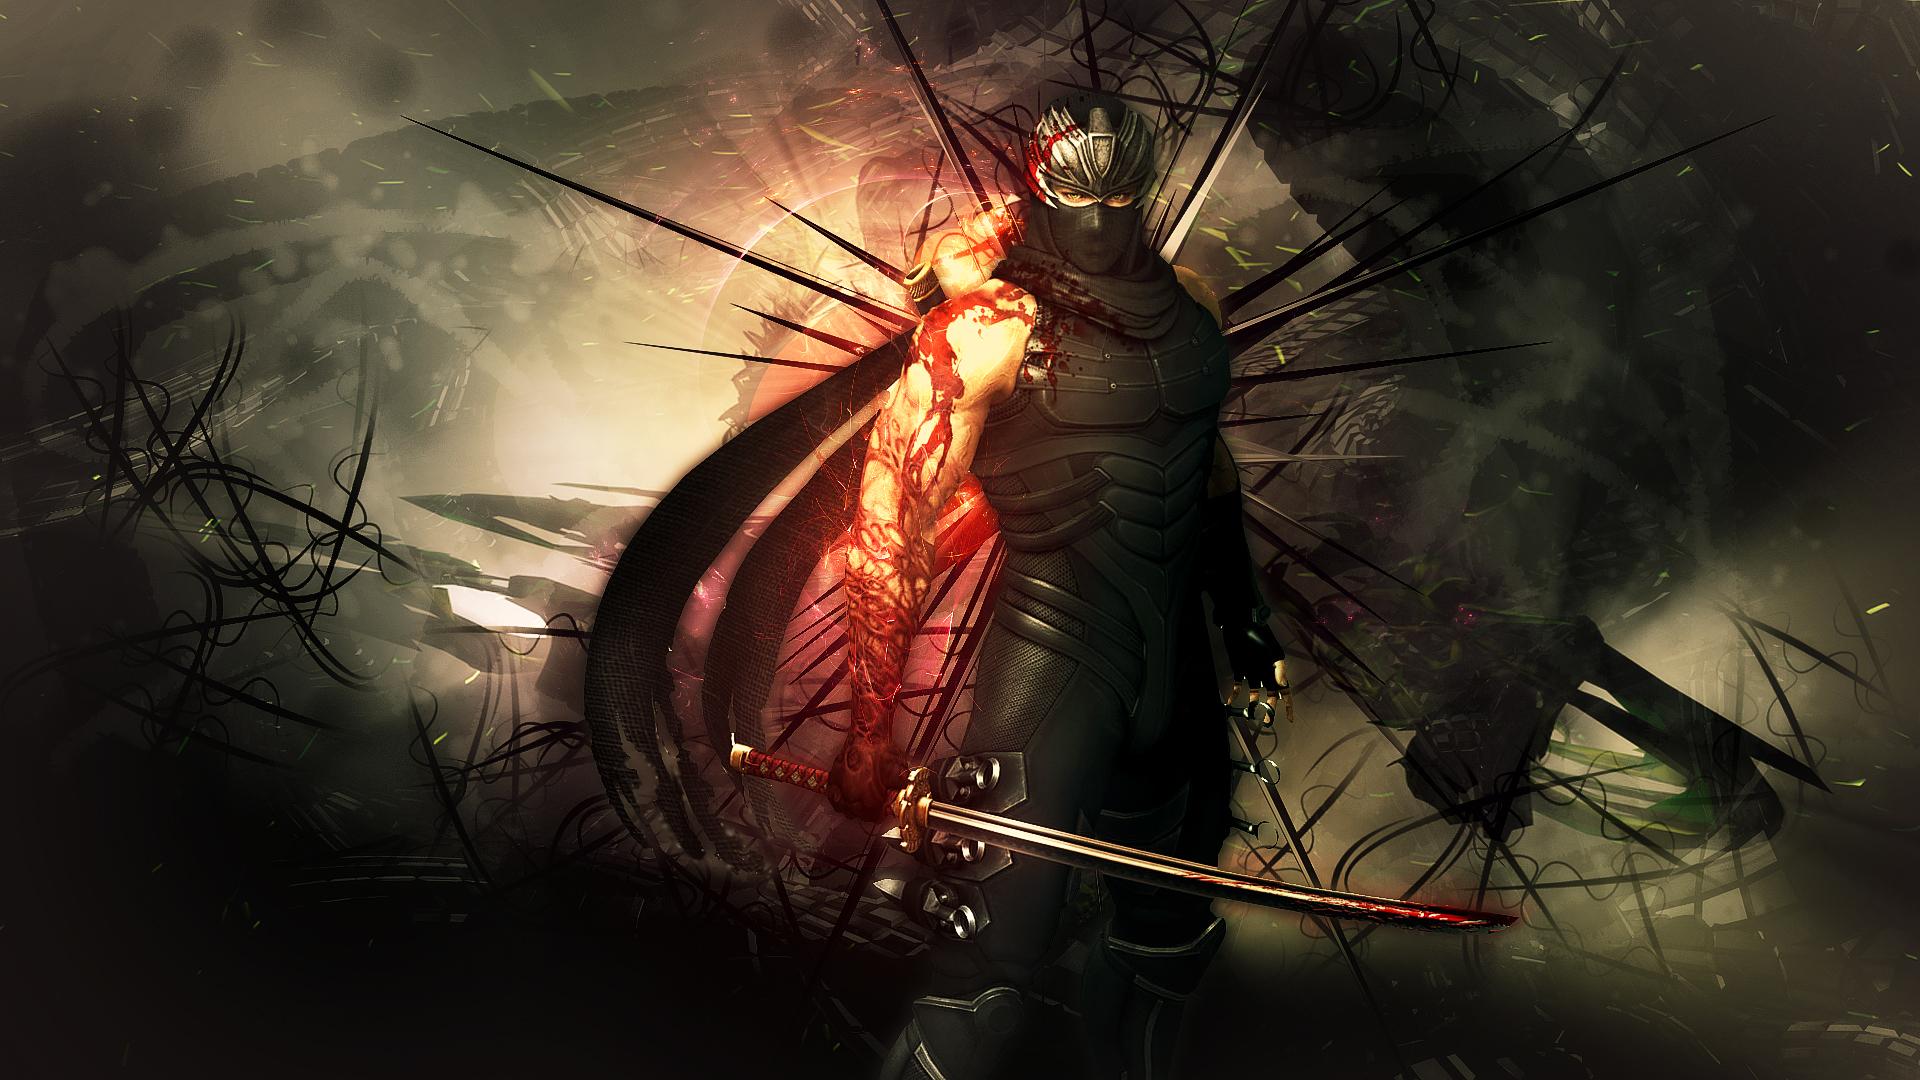 Ninja Gaiden HD Wallpaper Background Image 1920x1080 ID 1920x1080